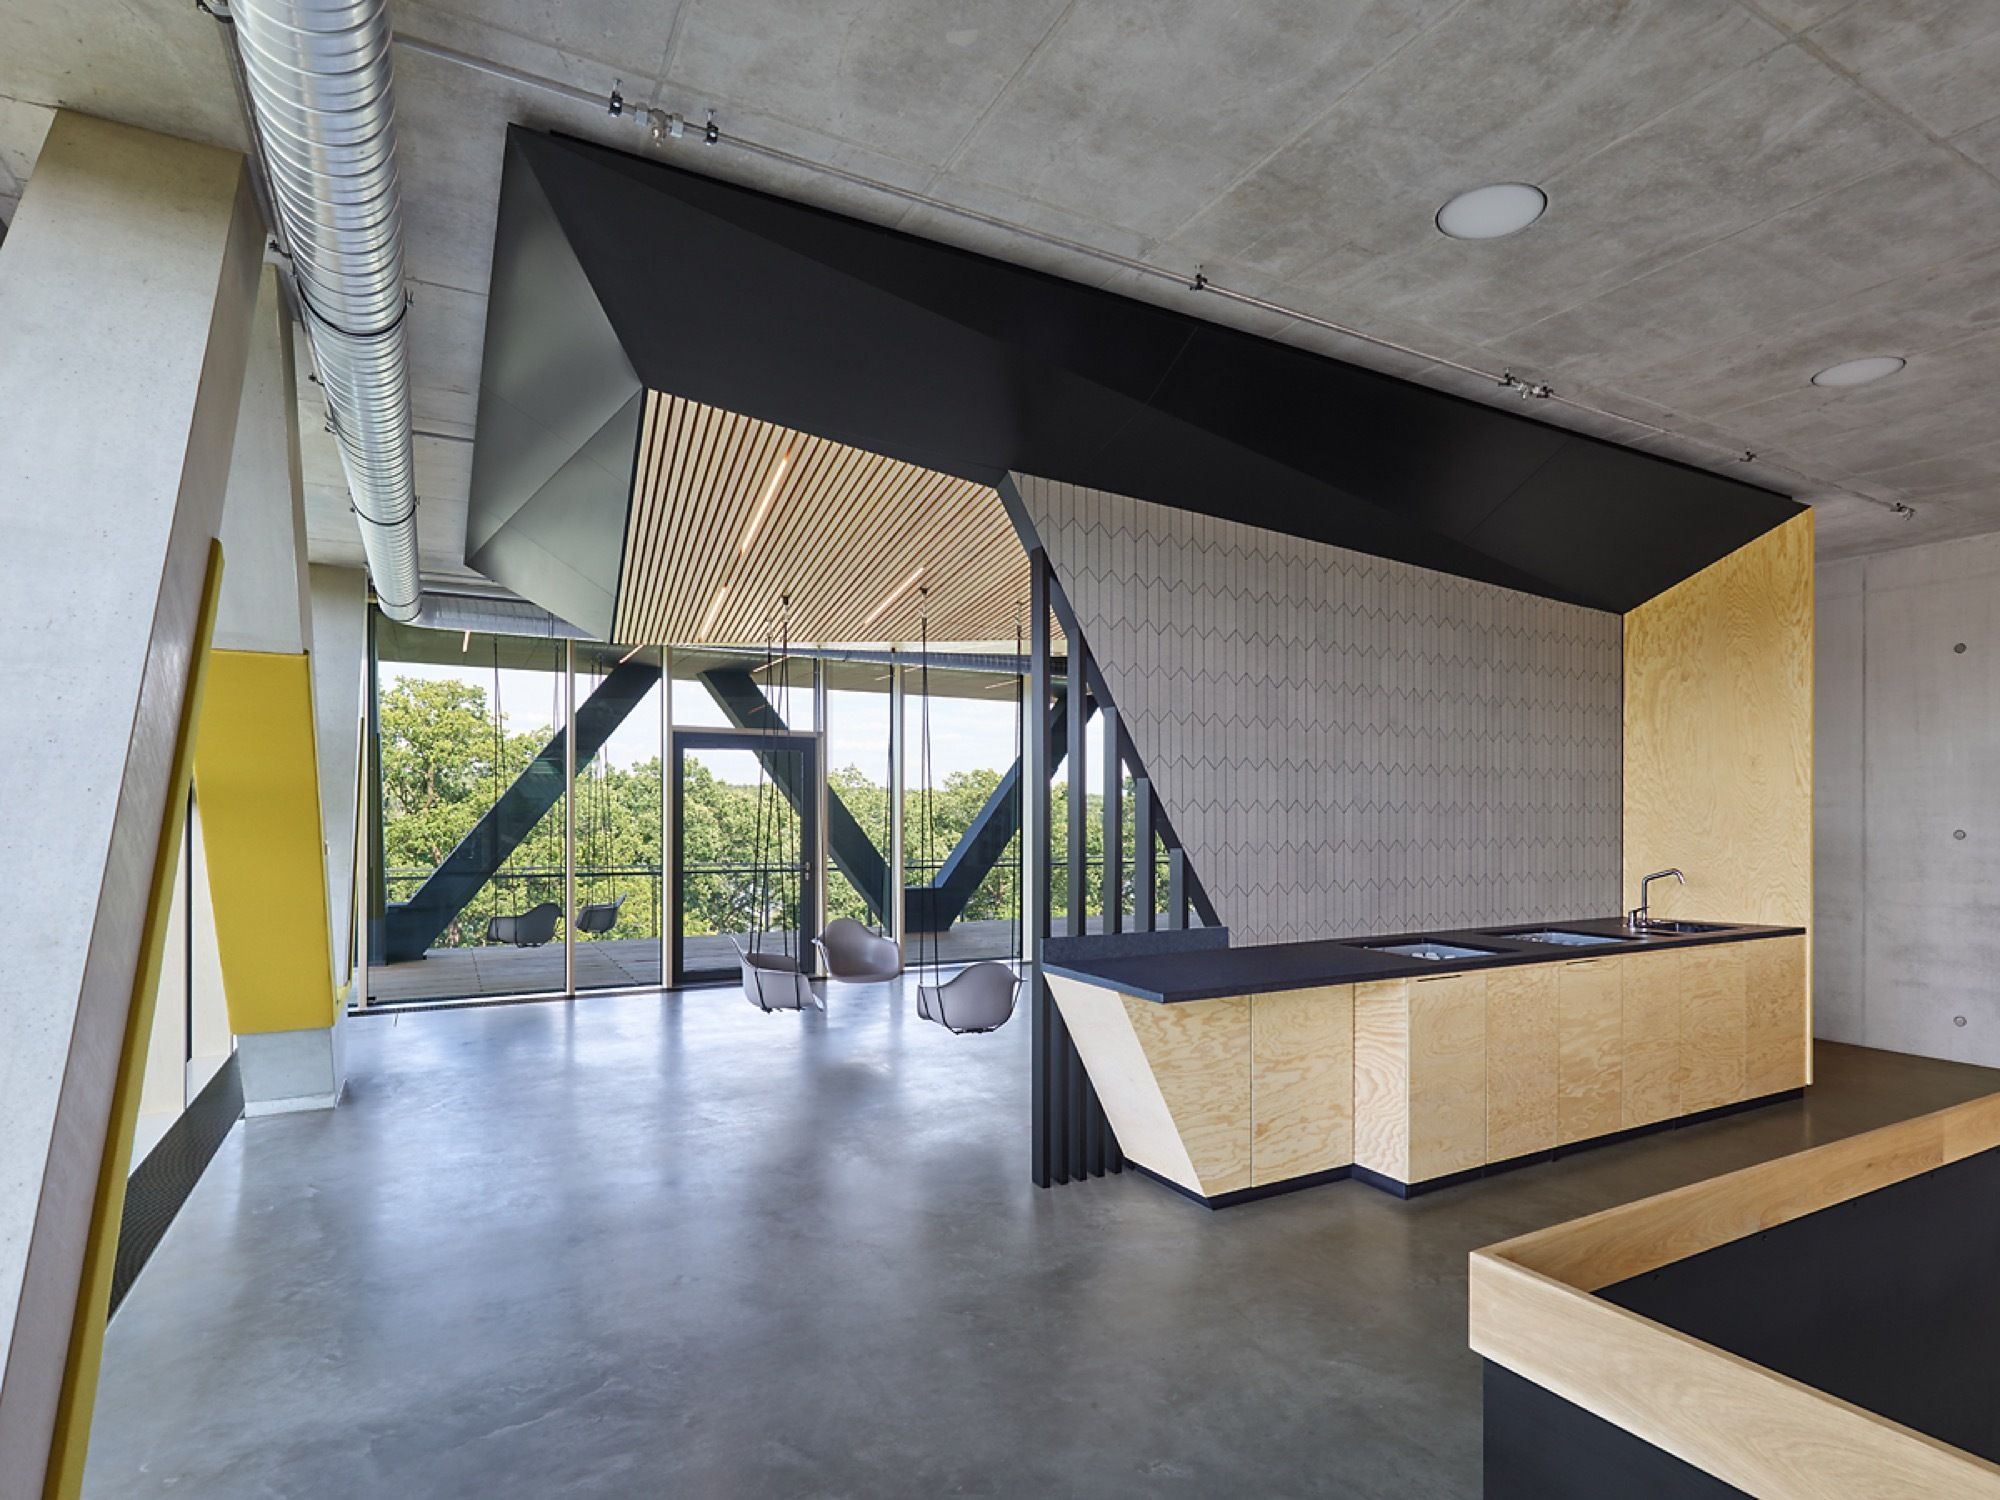 gallery of innovation center 2 0 scope architekten 15. Black Bedroom Furniture Sets. Home Design Ideas